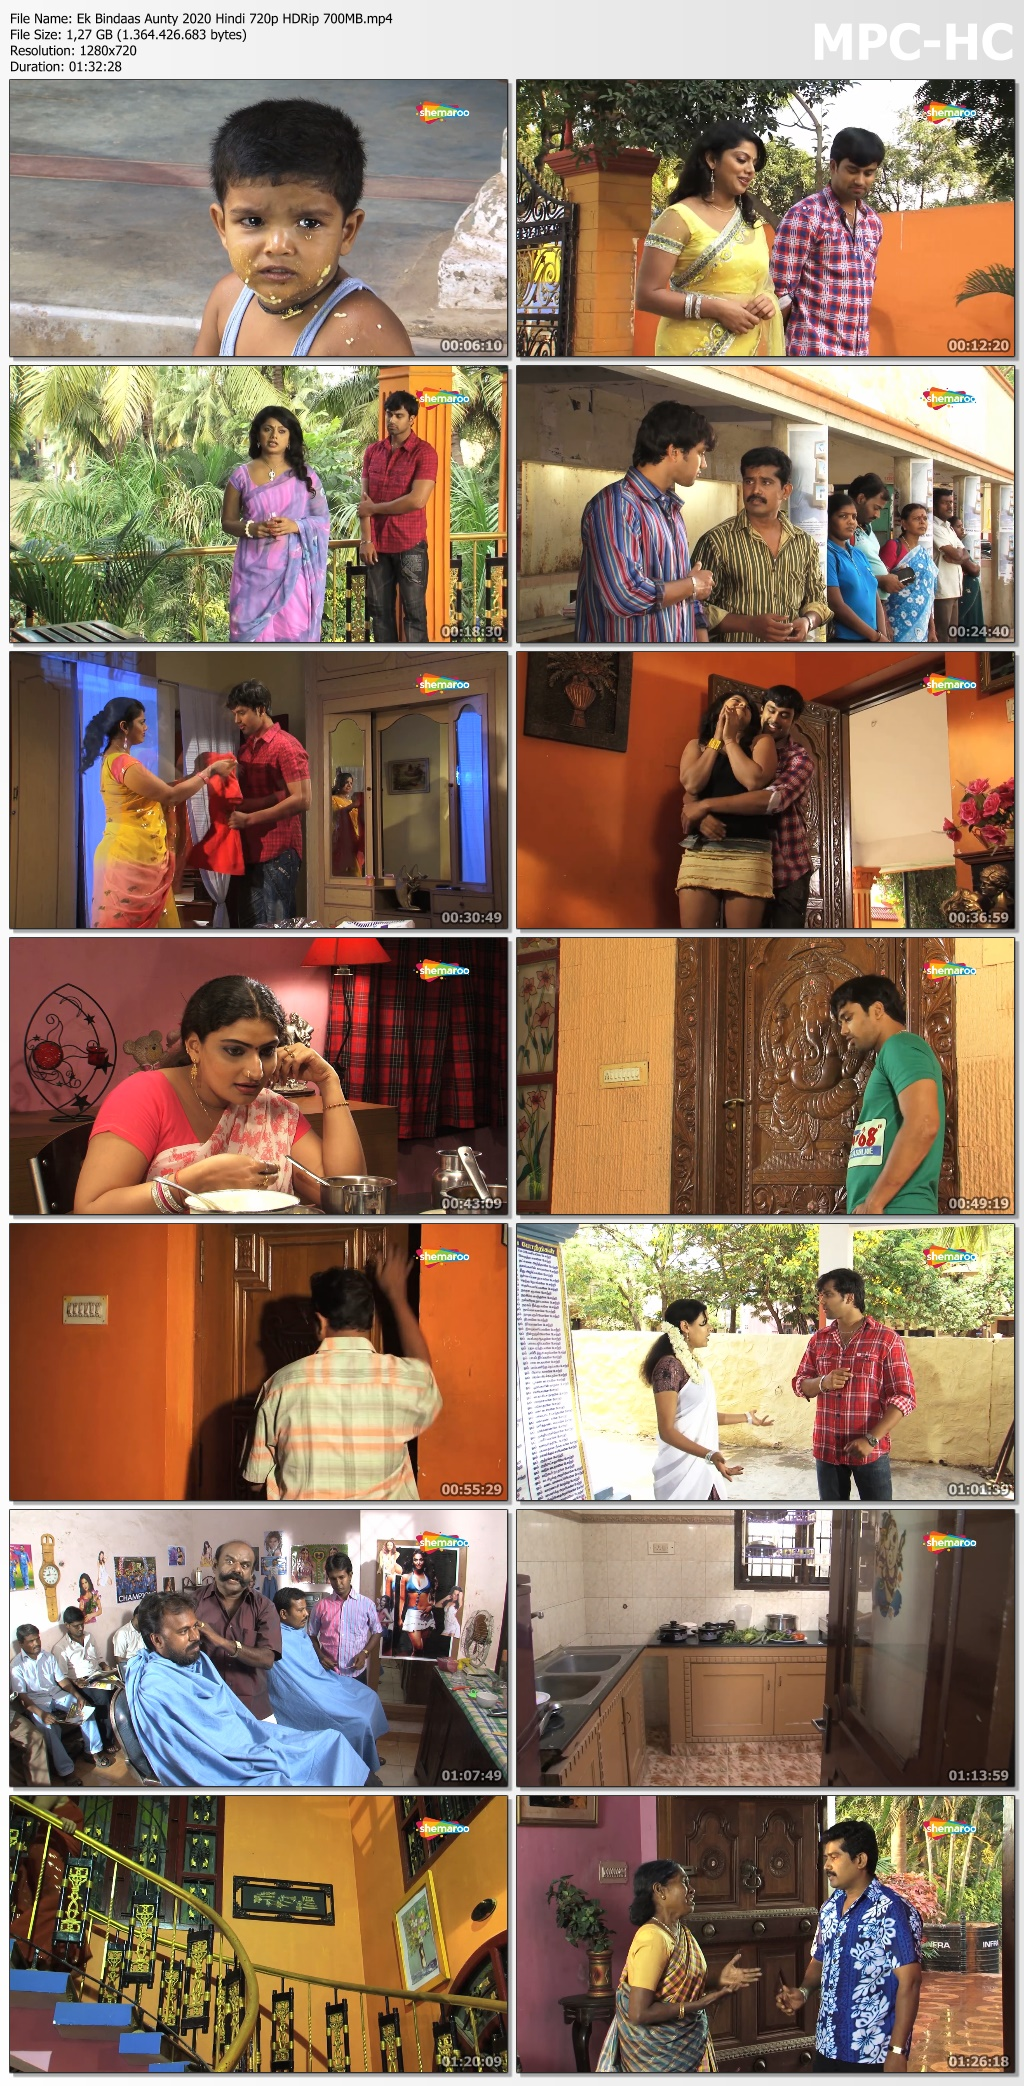 Ek-Bindaas-Aunty-2020-Hindi-720p-HDRip-700-MB-mp4-thumbs